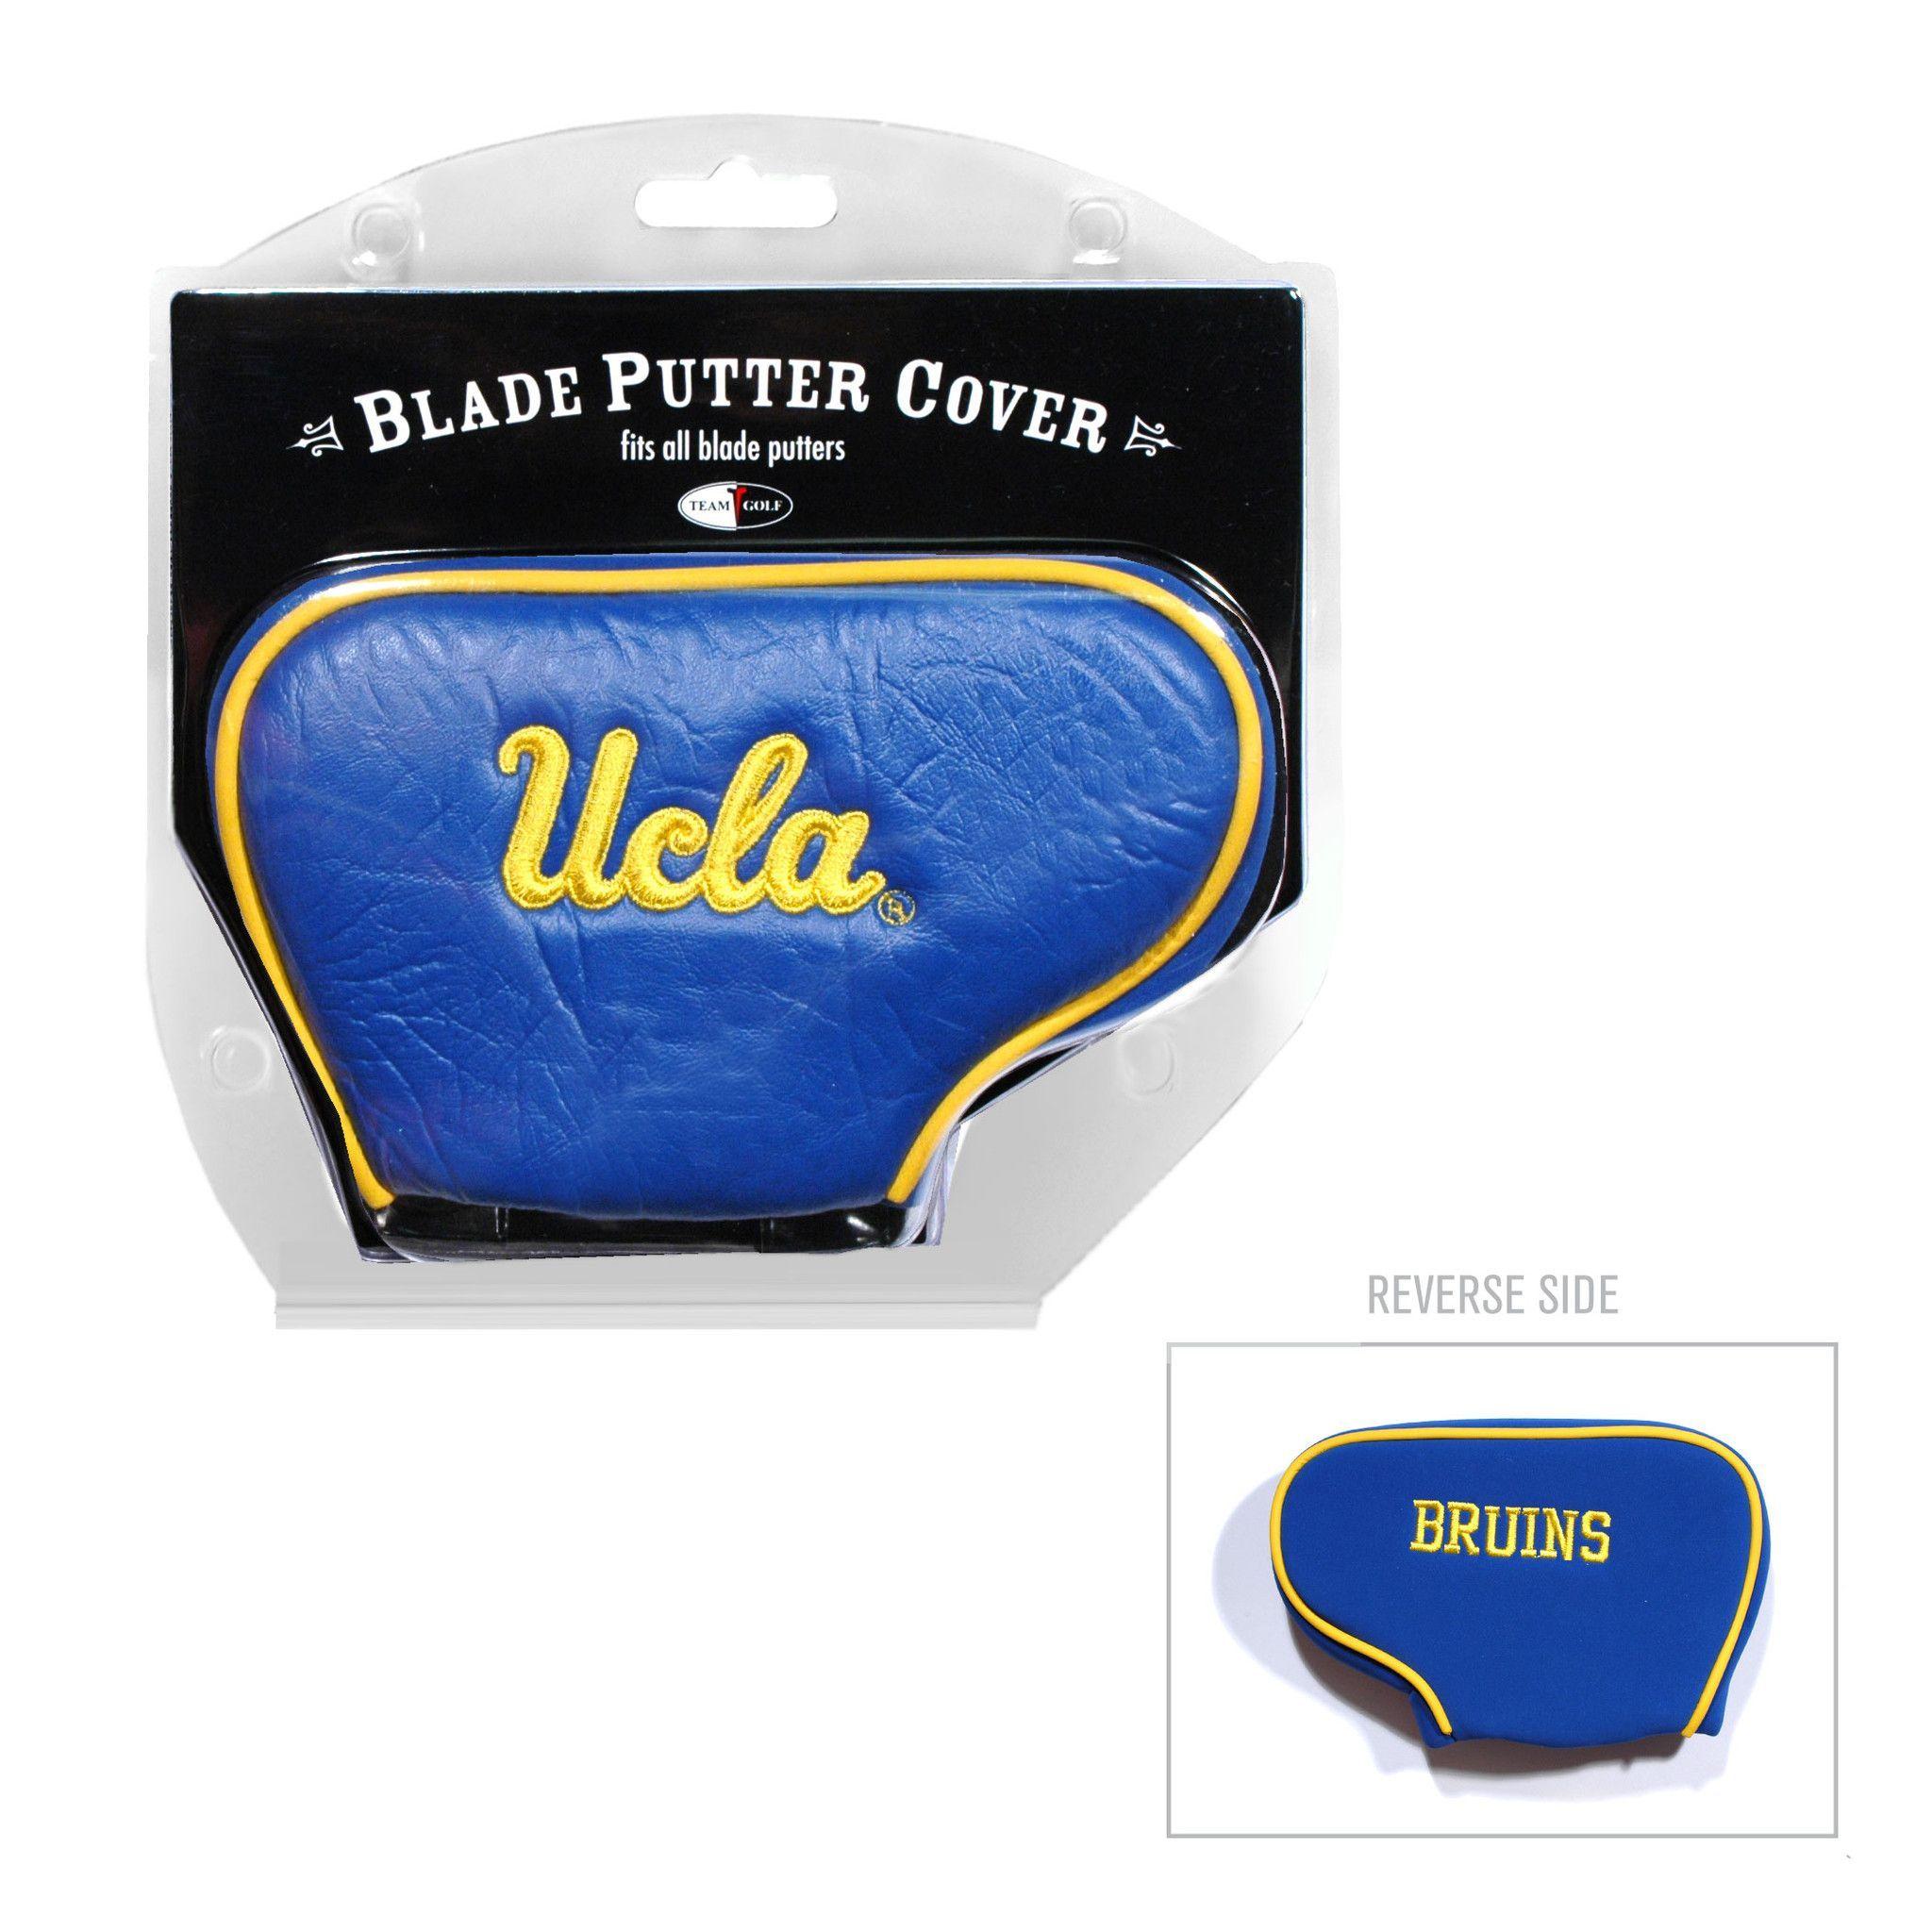 UCLA Bruins Blade Putter Cover